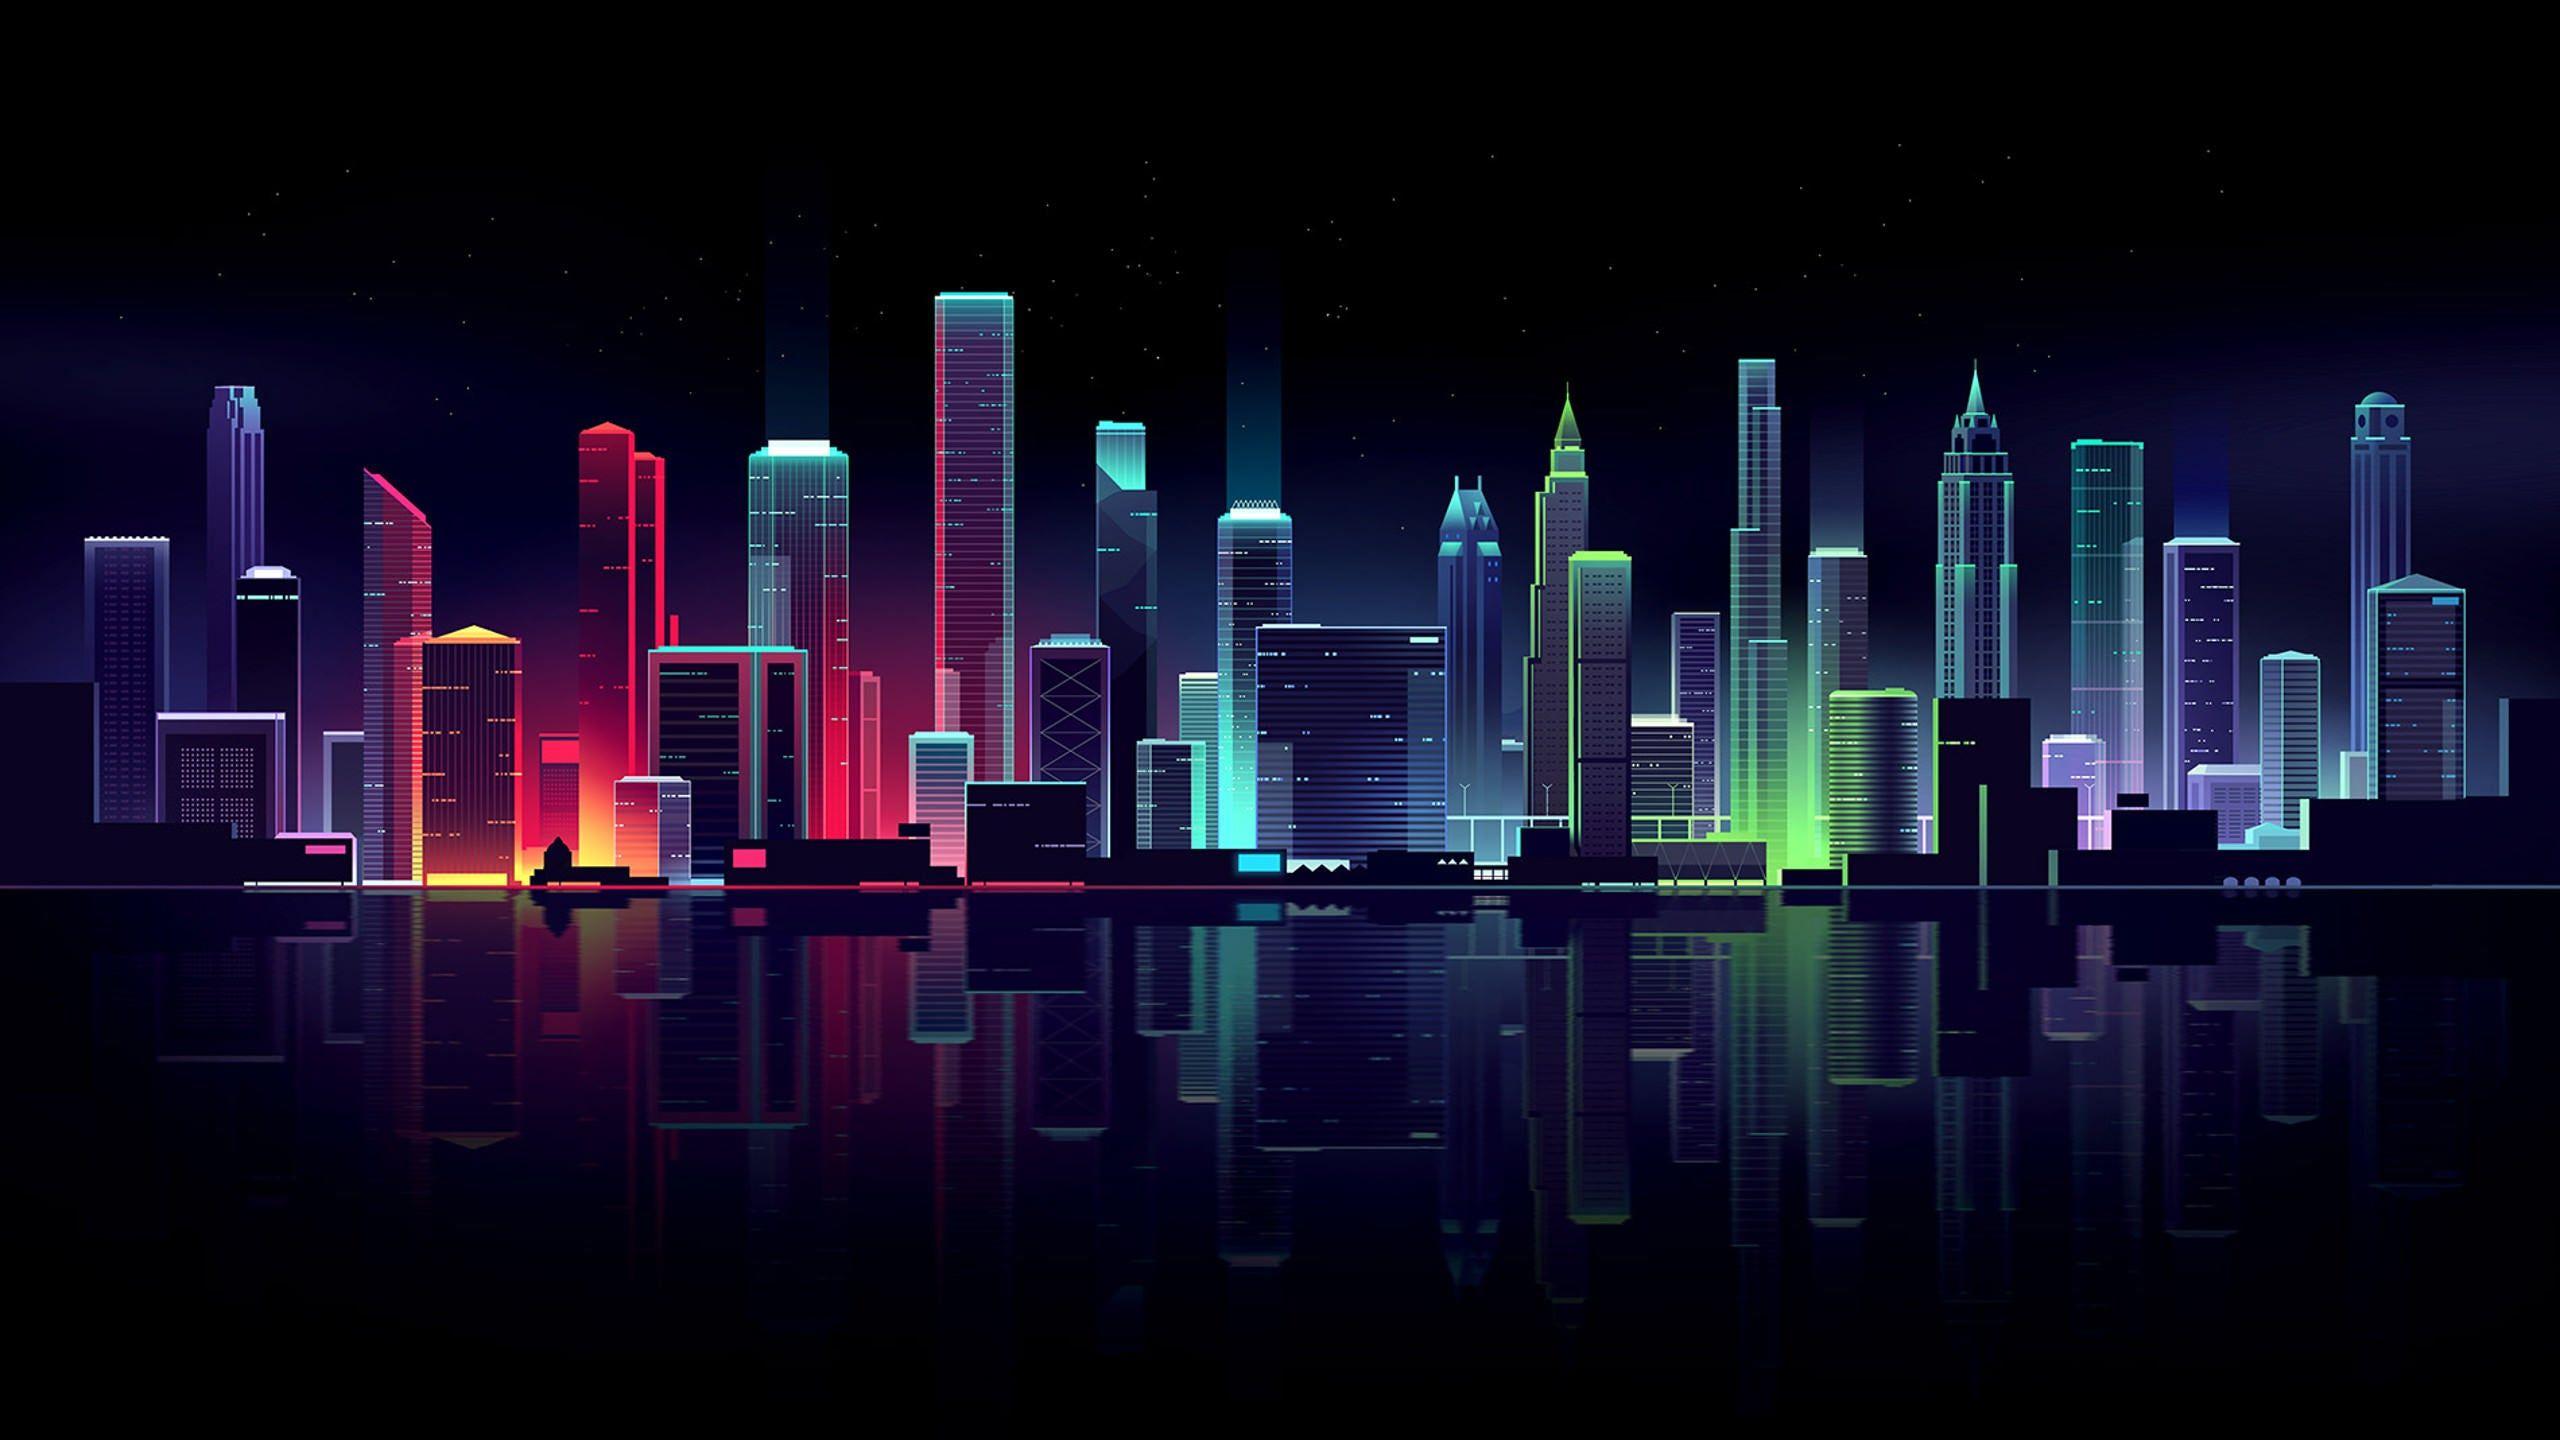 Minimalistic City Skyline Hd Wallpaper City Wallpaper Cityscape Wallpaper Neon Wallpaper